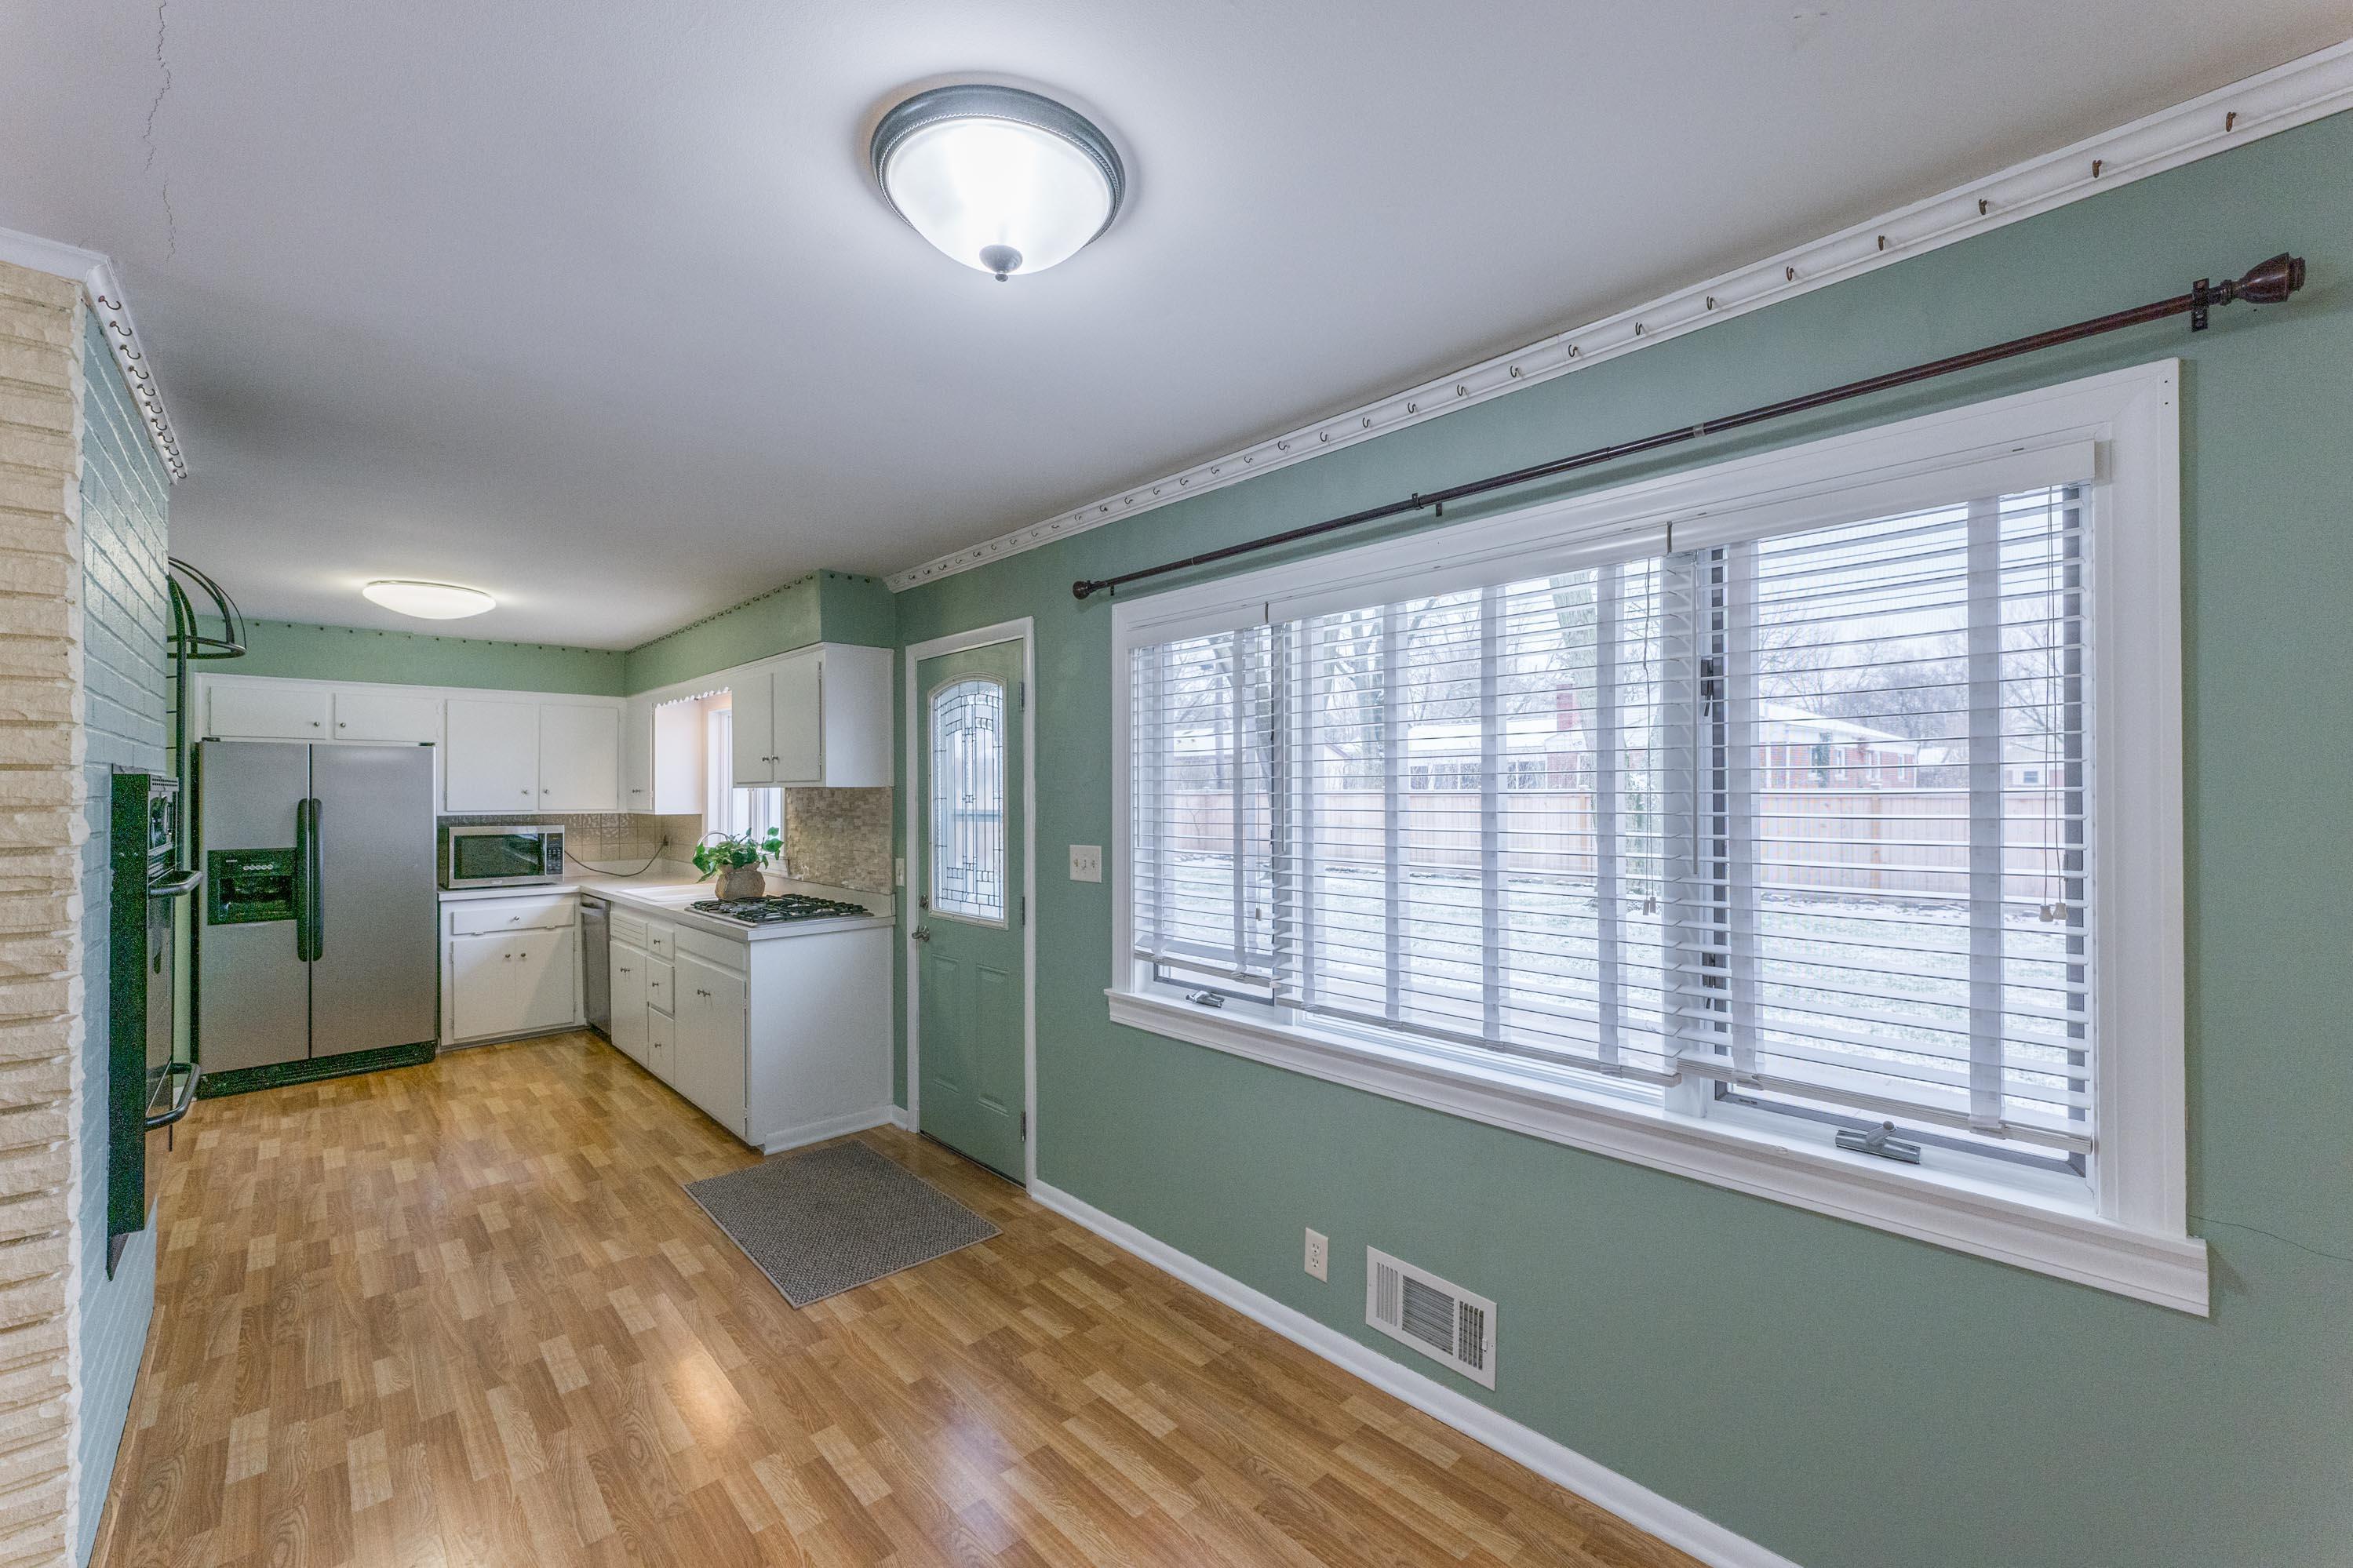 2711 Mount Holyoke Road, Upper Arlington, Ohio 43221, 3 Bedrooms Bedrooms, ,2 BathroomsBathrooms,Residential,For Sale,Mount Holyoke,221000044